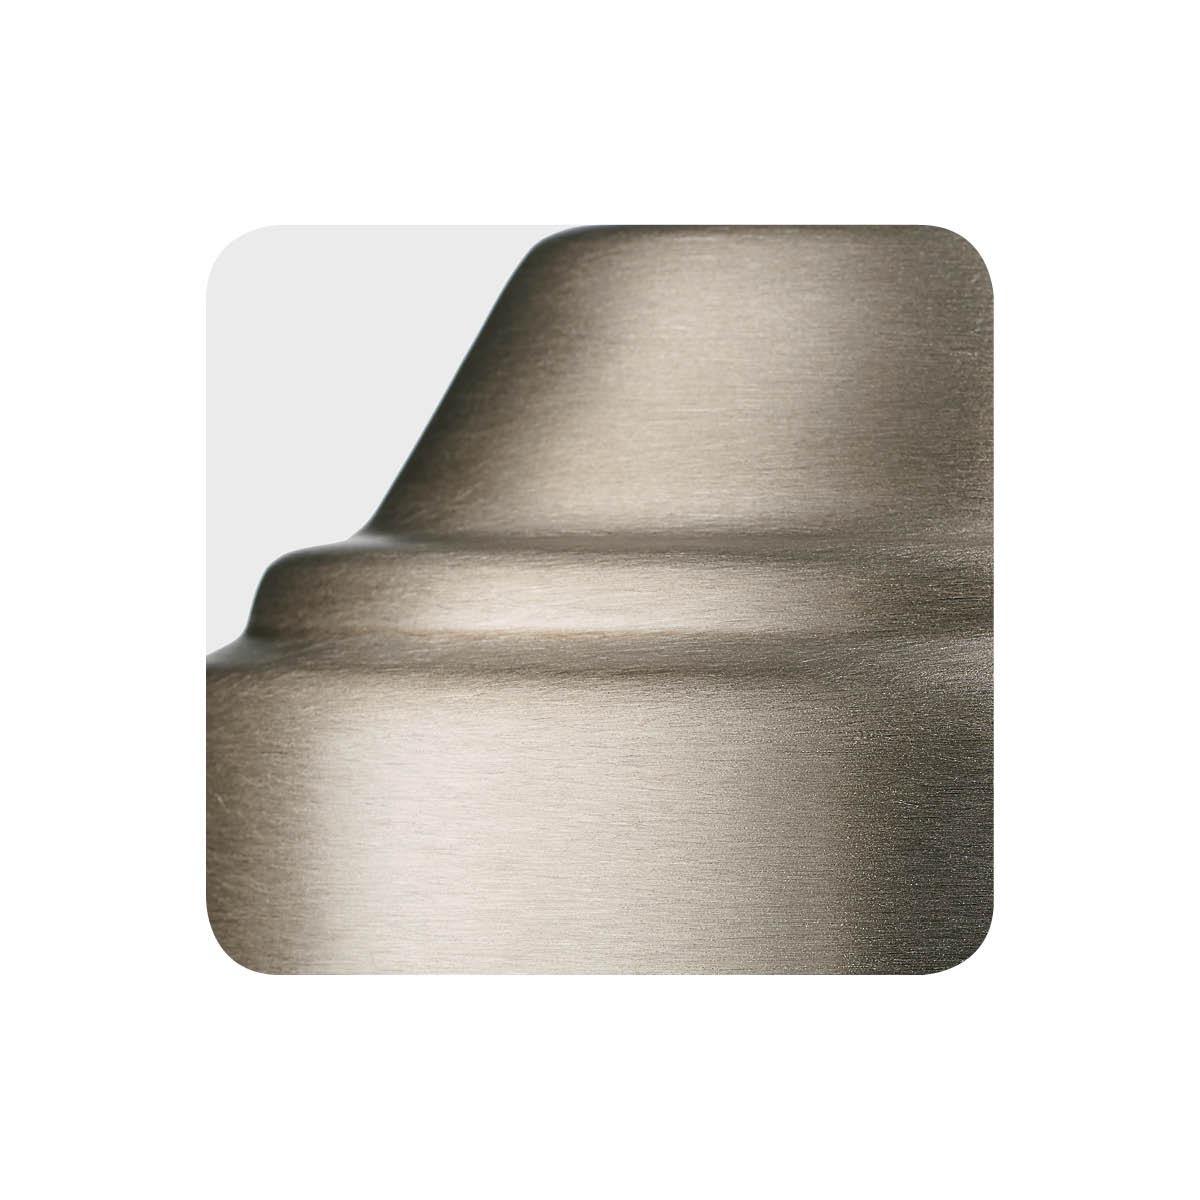 Satin Nickel Alternative Metal Finish sample